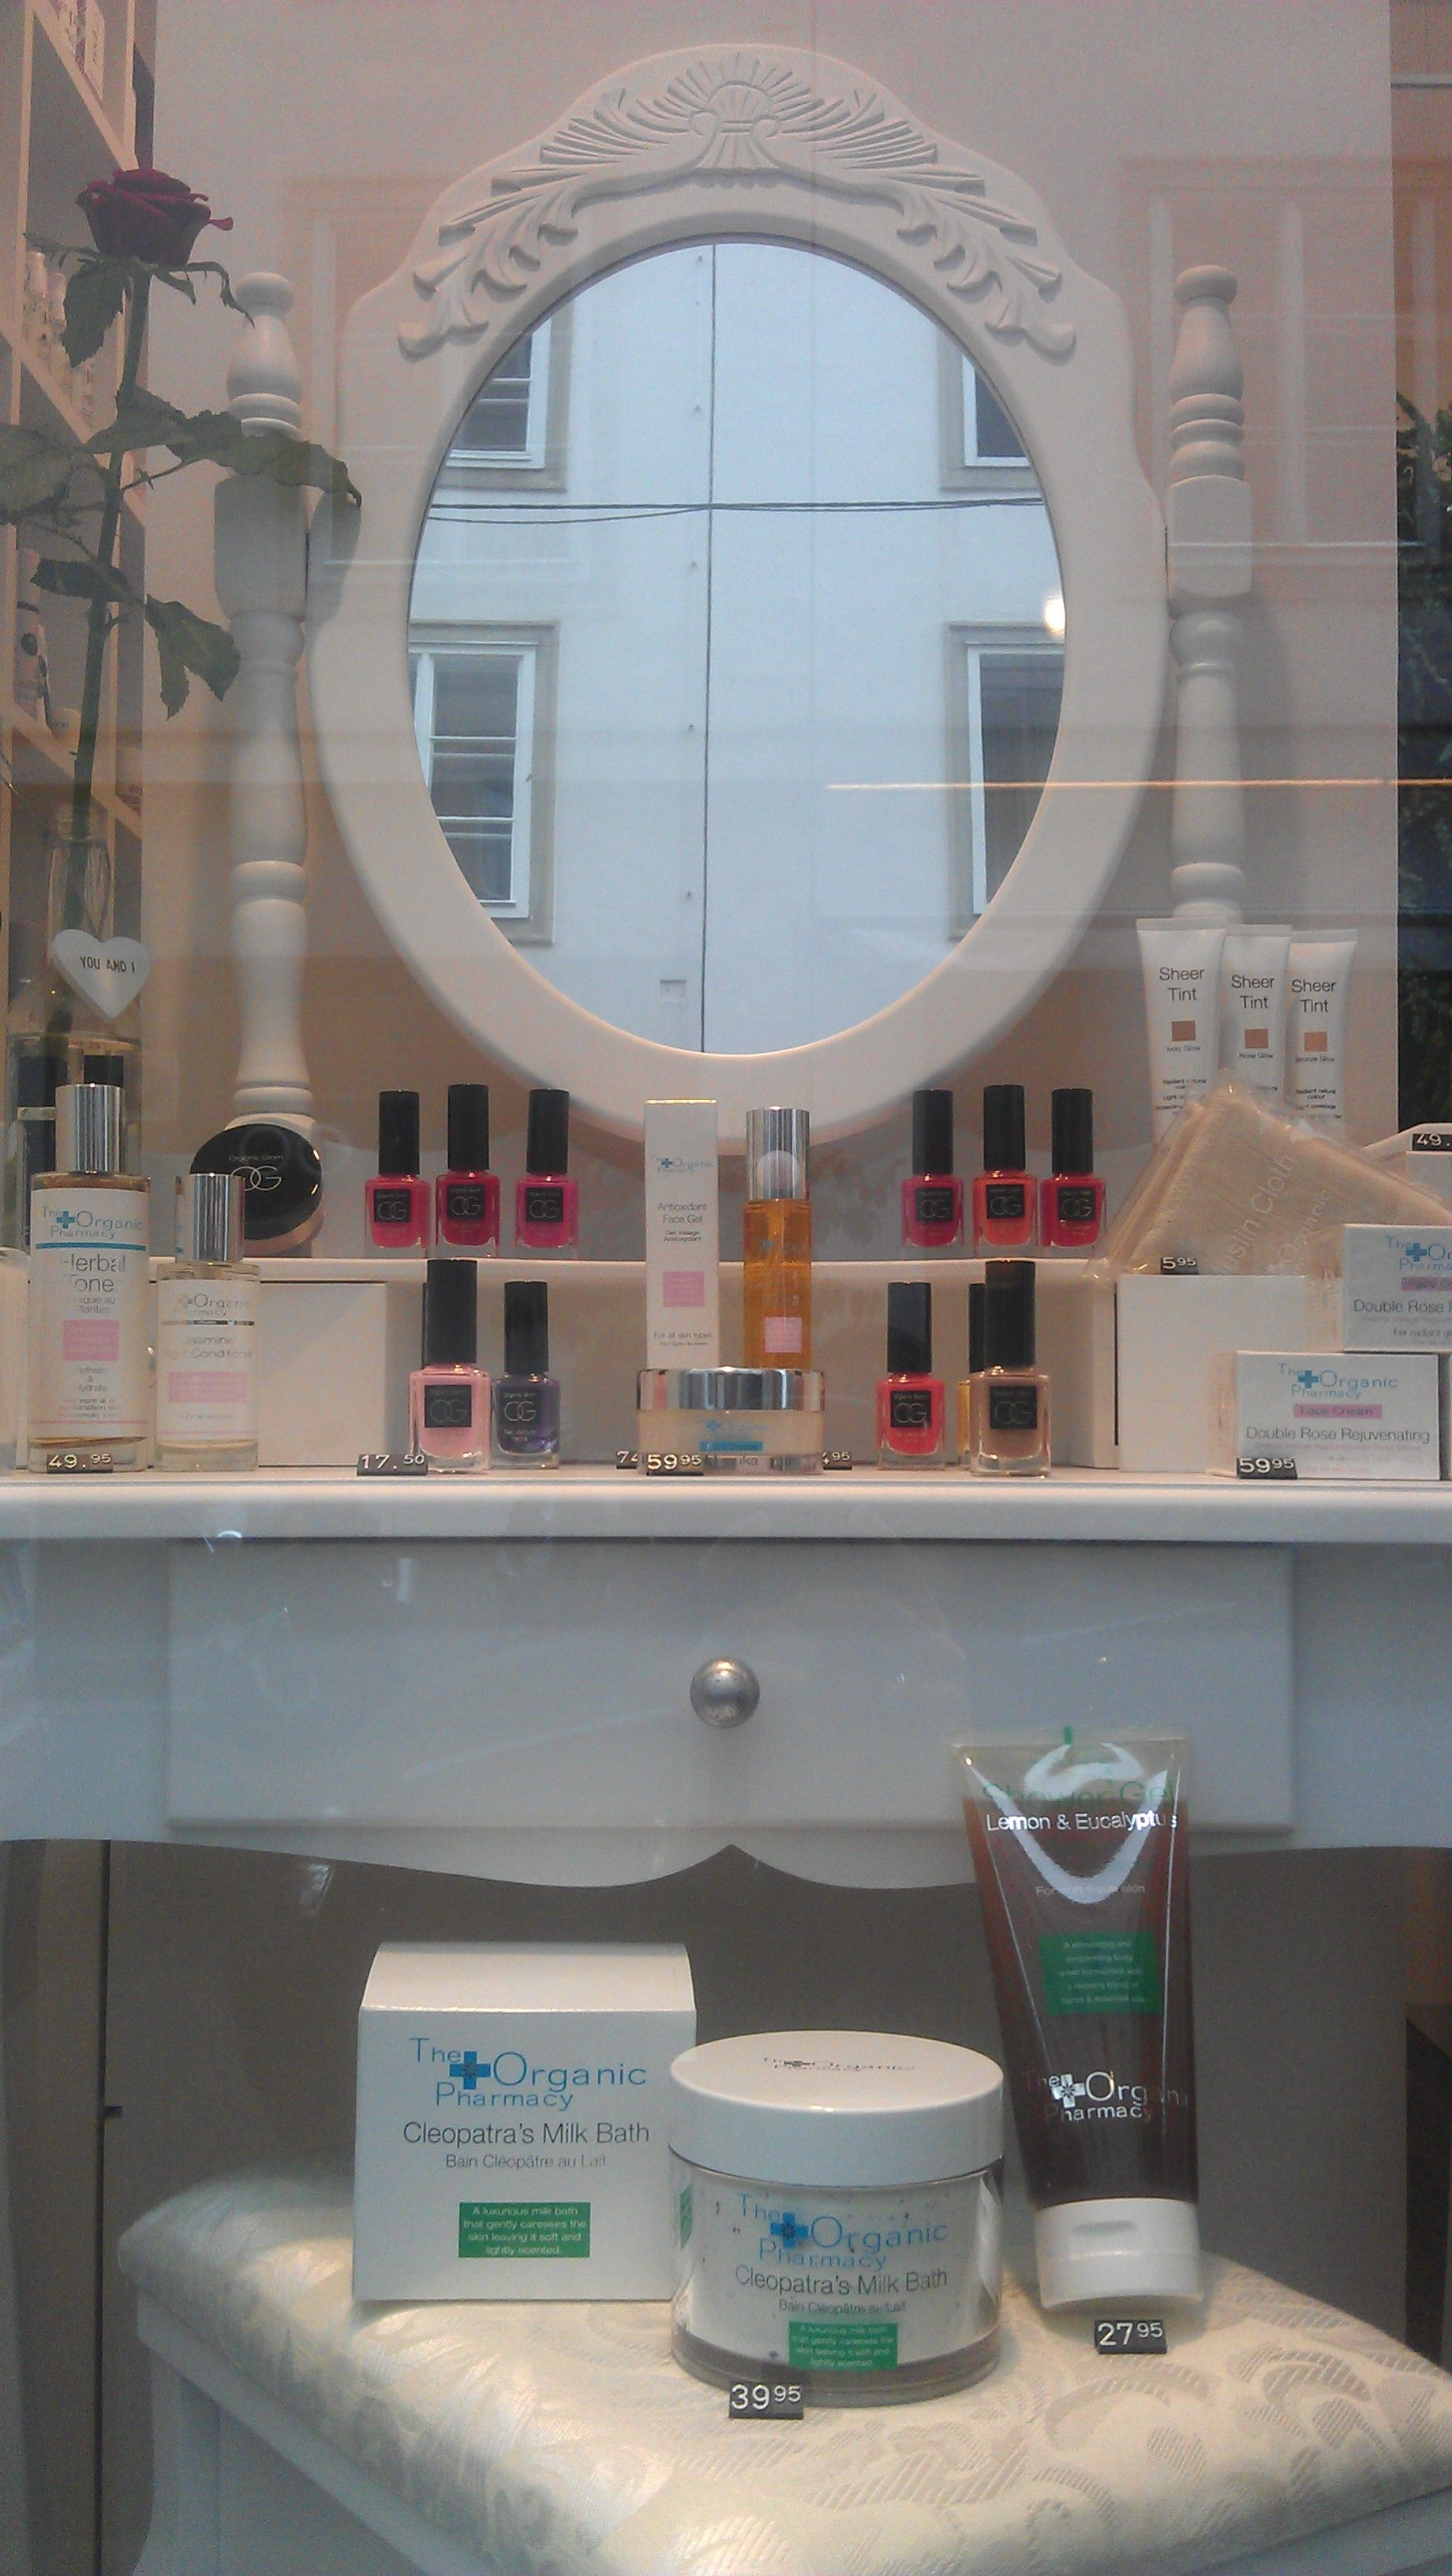 The Organic Pharmacy organische Hightech Pflege aus London & Organic Glam Non-Toxic Nagellacke und Make-up